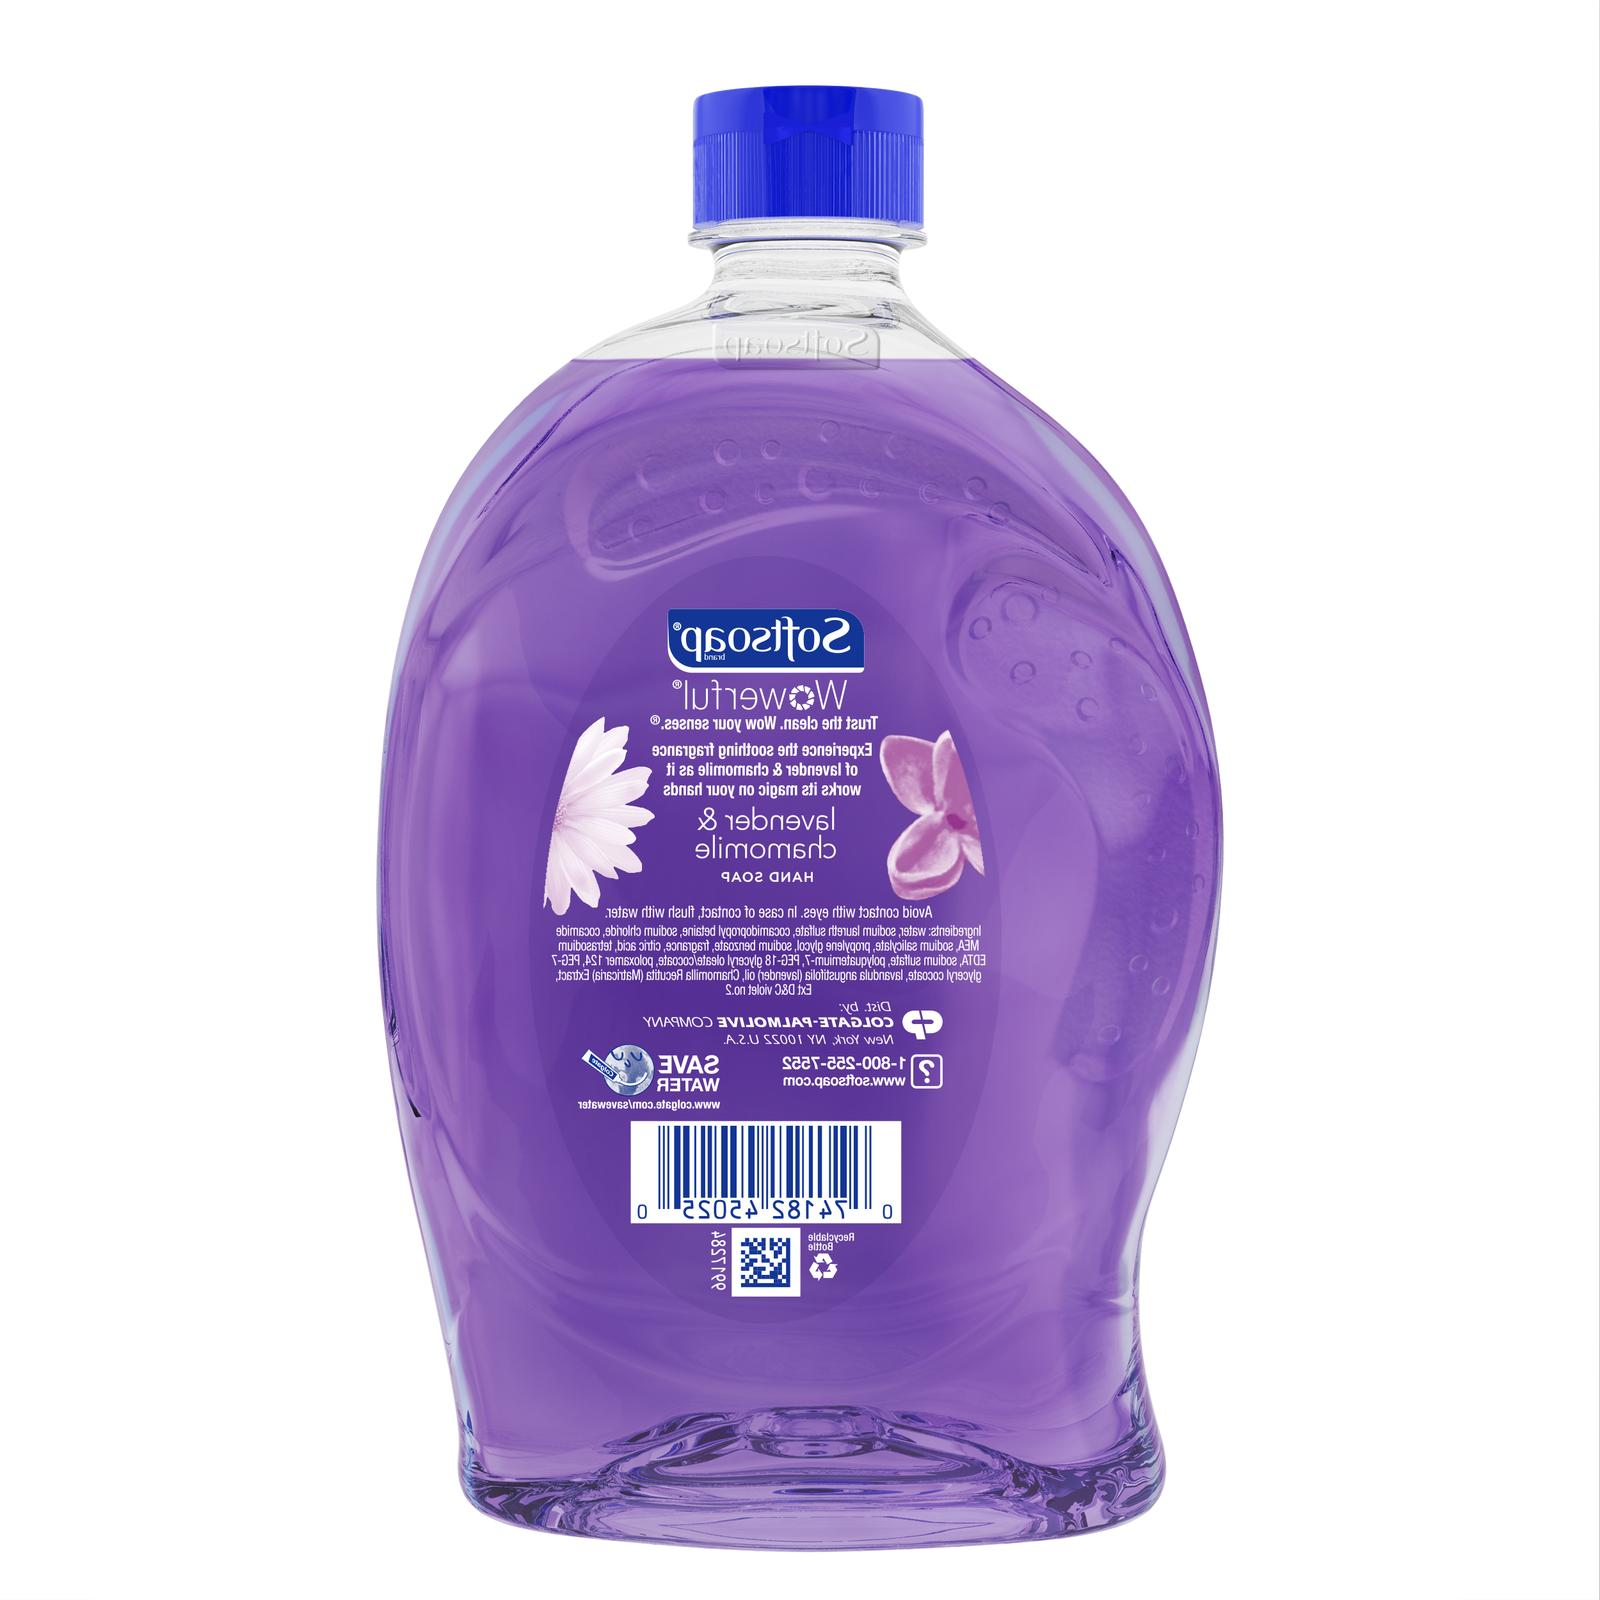 Softsoap Soap Refill, - 56 fl oz